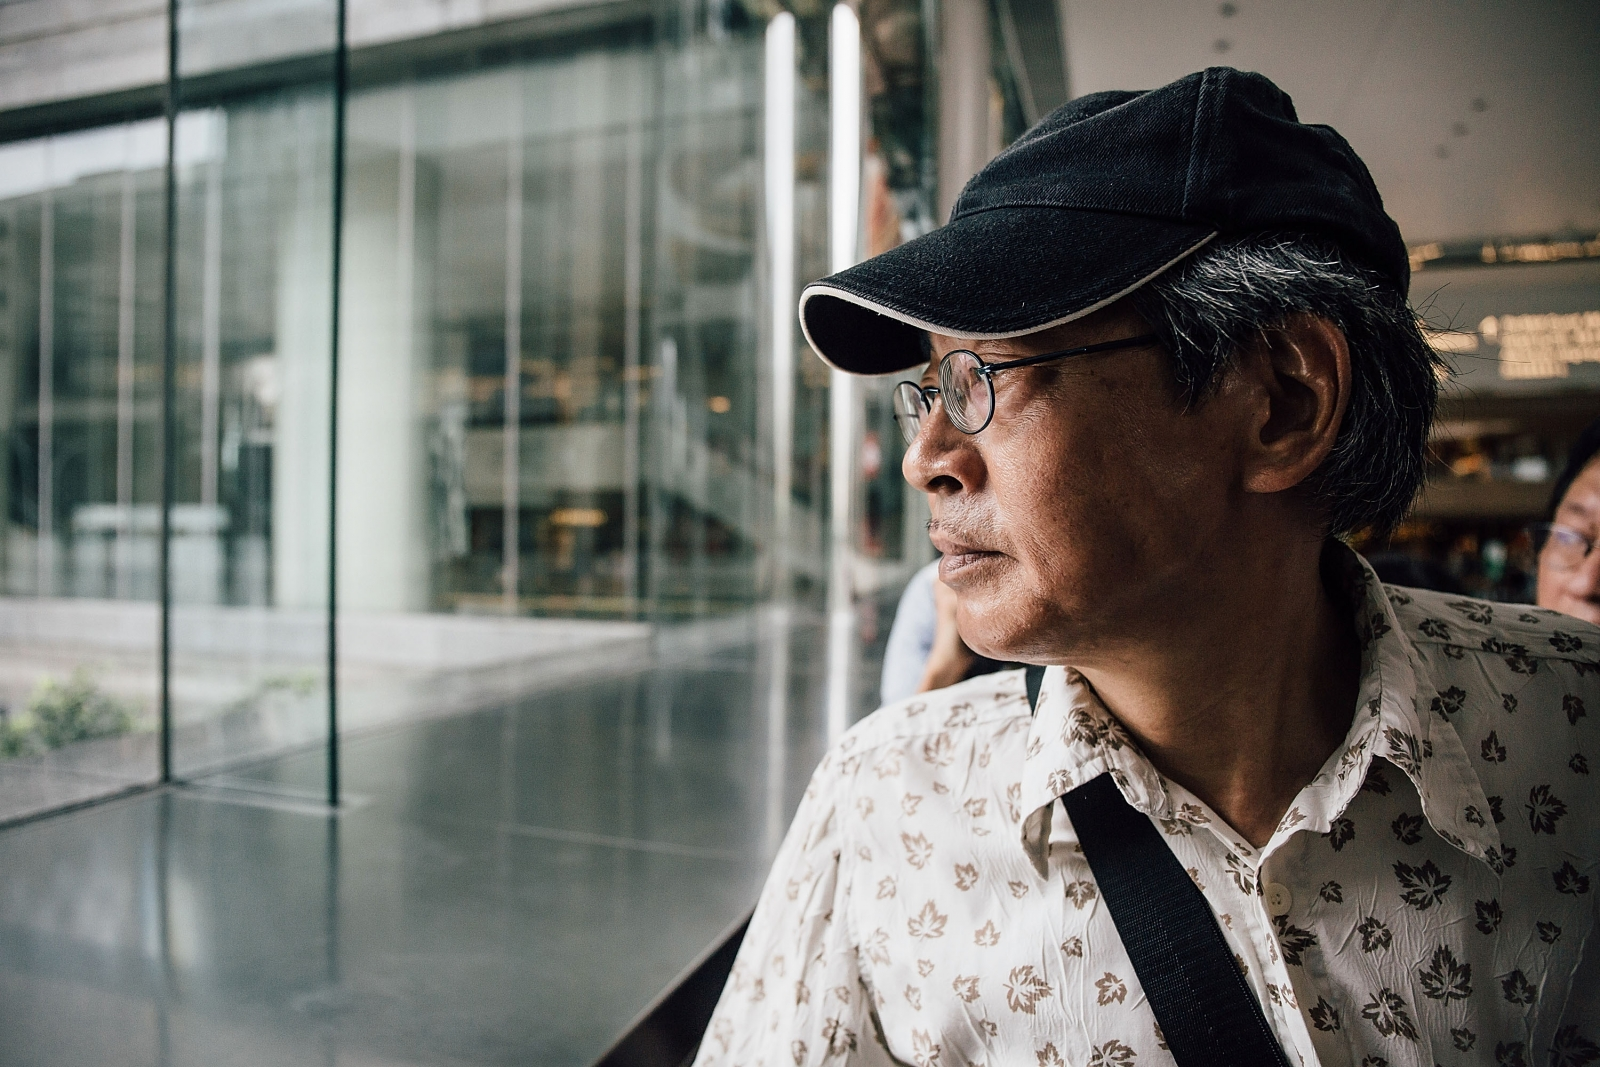 Released Hong Kong Bookseller Lam Wing Kee